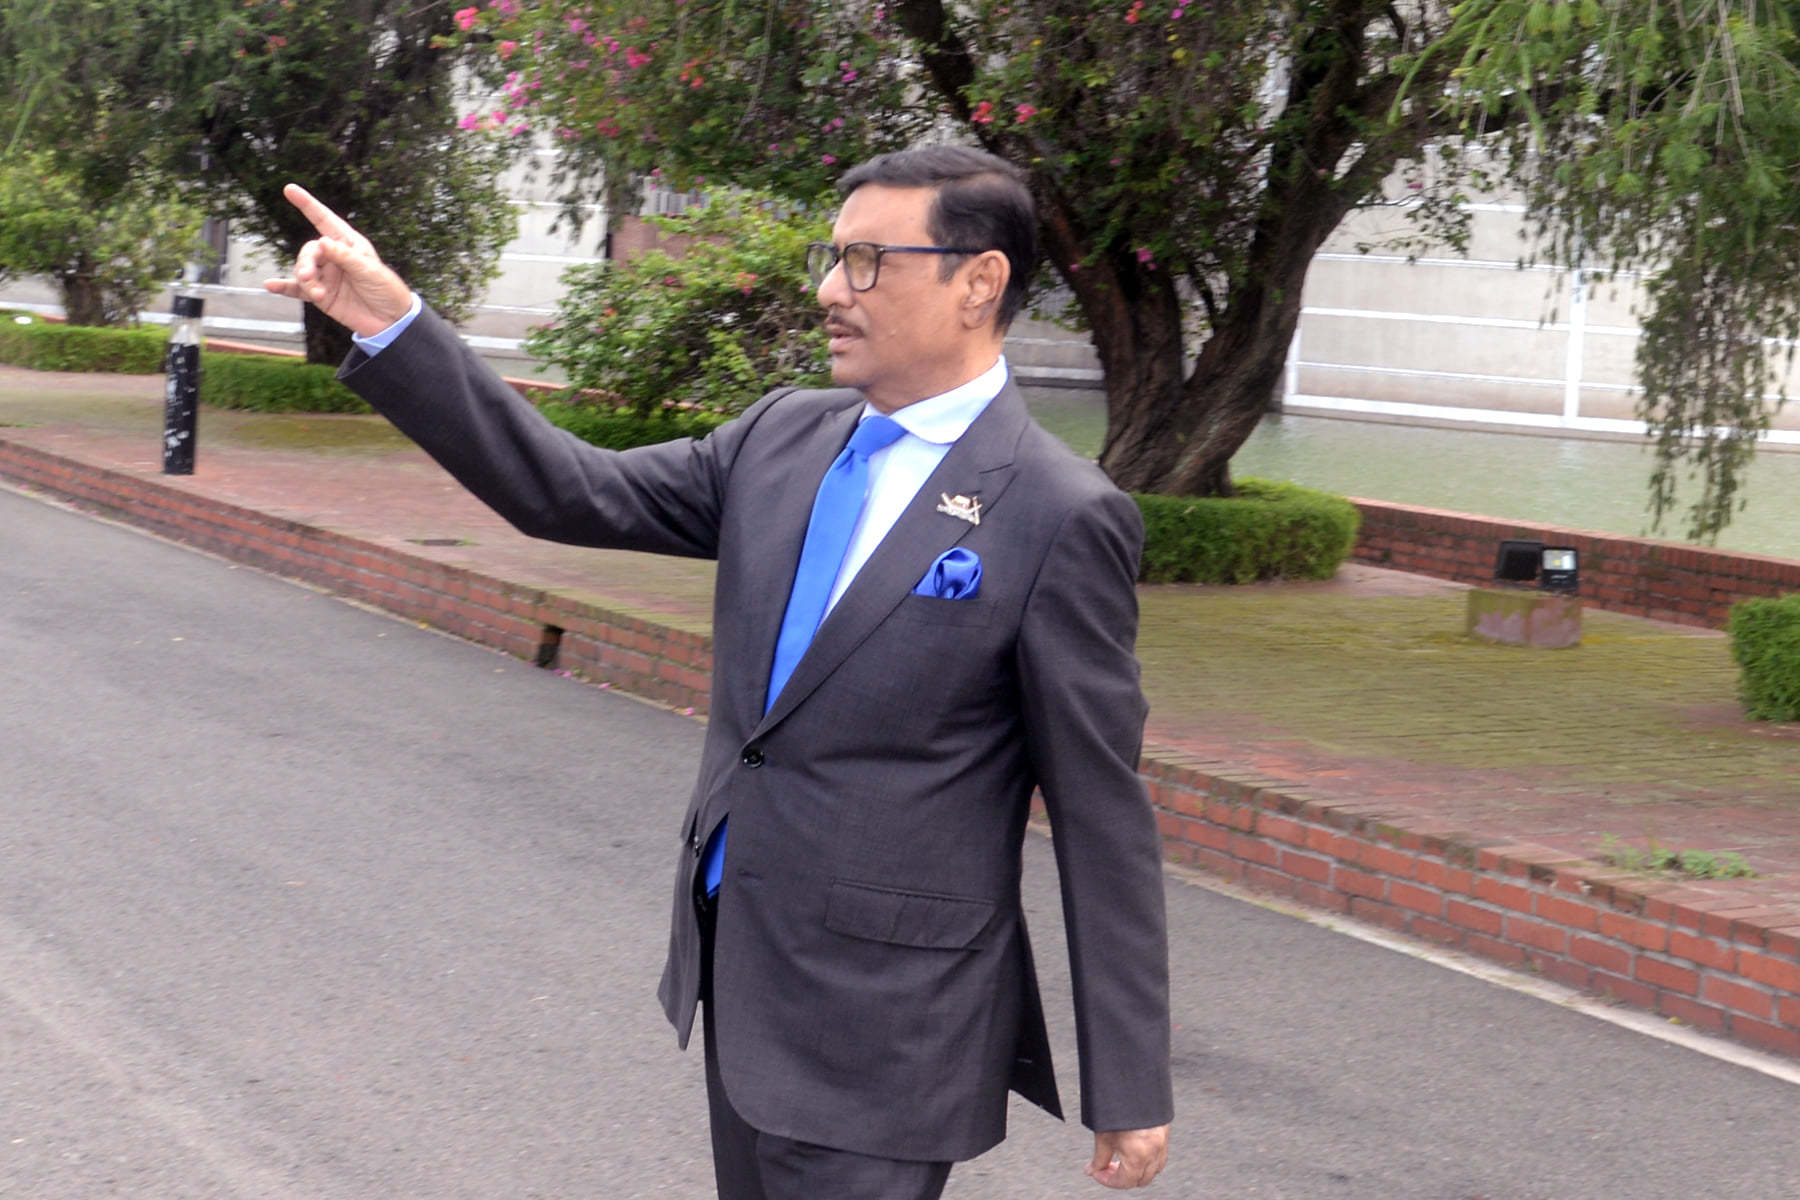 FOTO: O nouă specie de ministru în Bangladesh, ministrul influencer